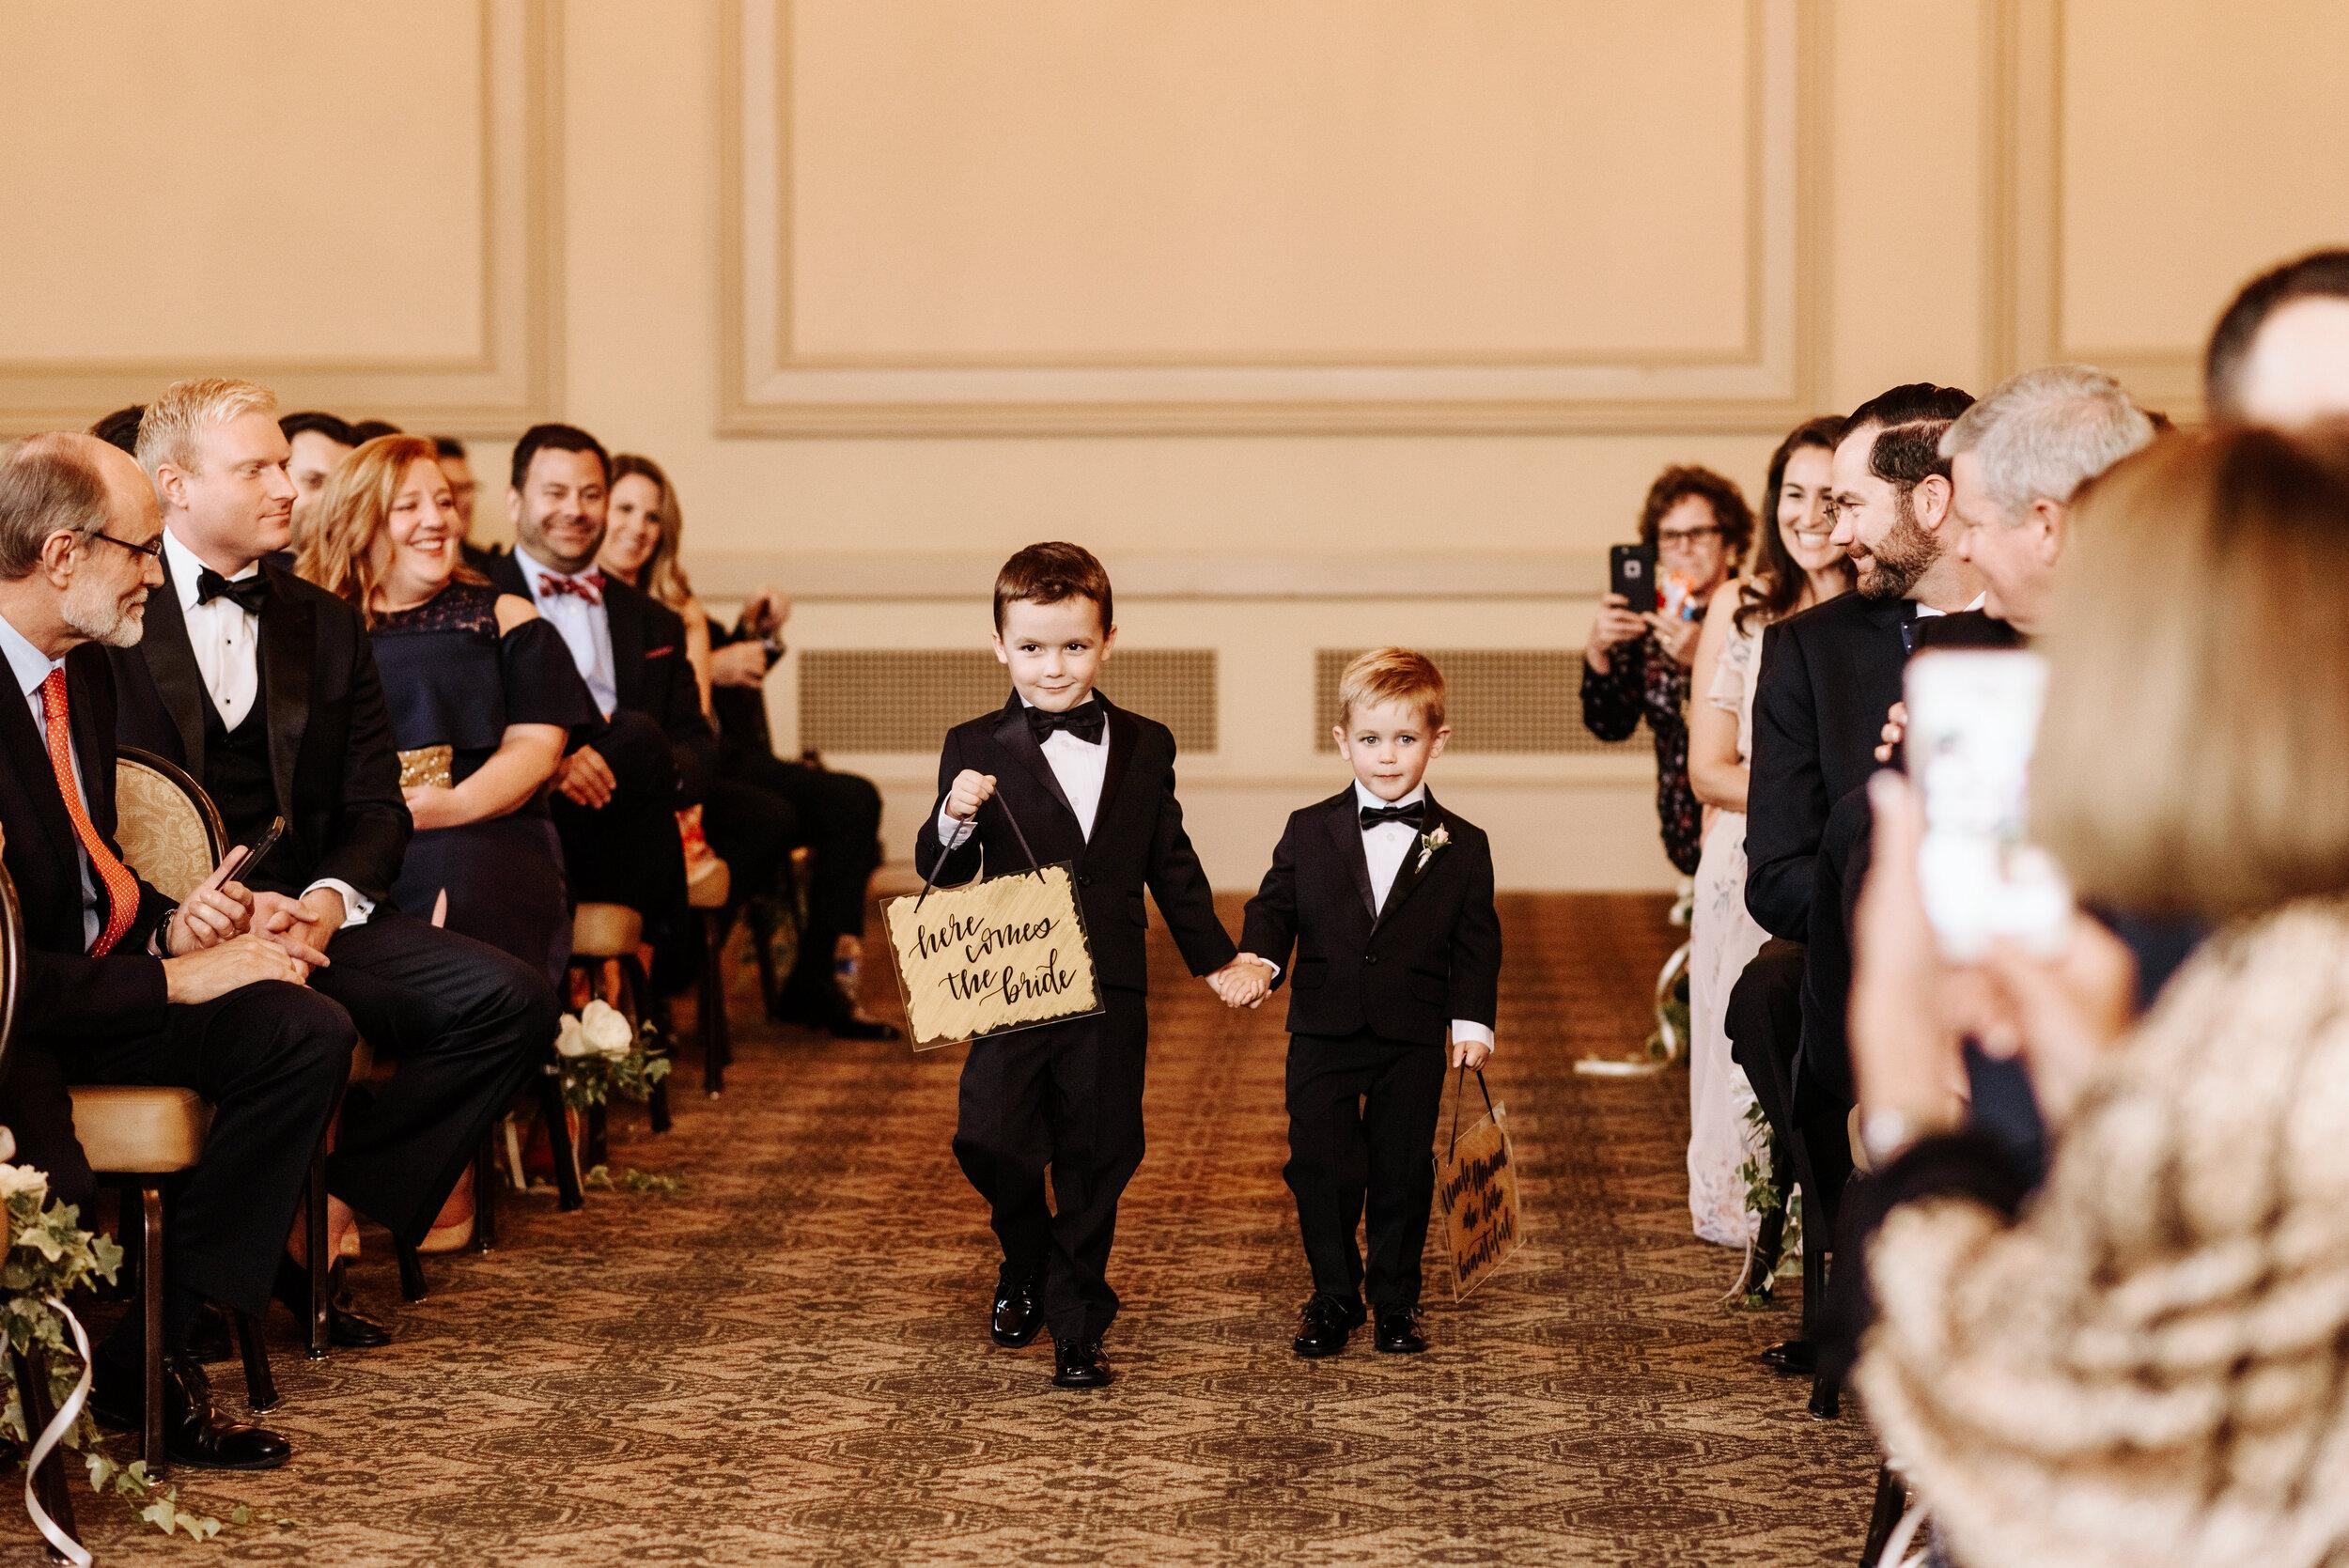 Cassie-Mrunal-Wedding-Quirk-Hotel-John-Marshall-Ballrooms-Richmond-Virginia-Photography-by-V-68.jpg